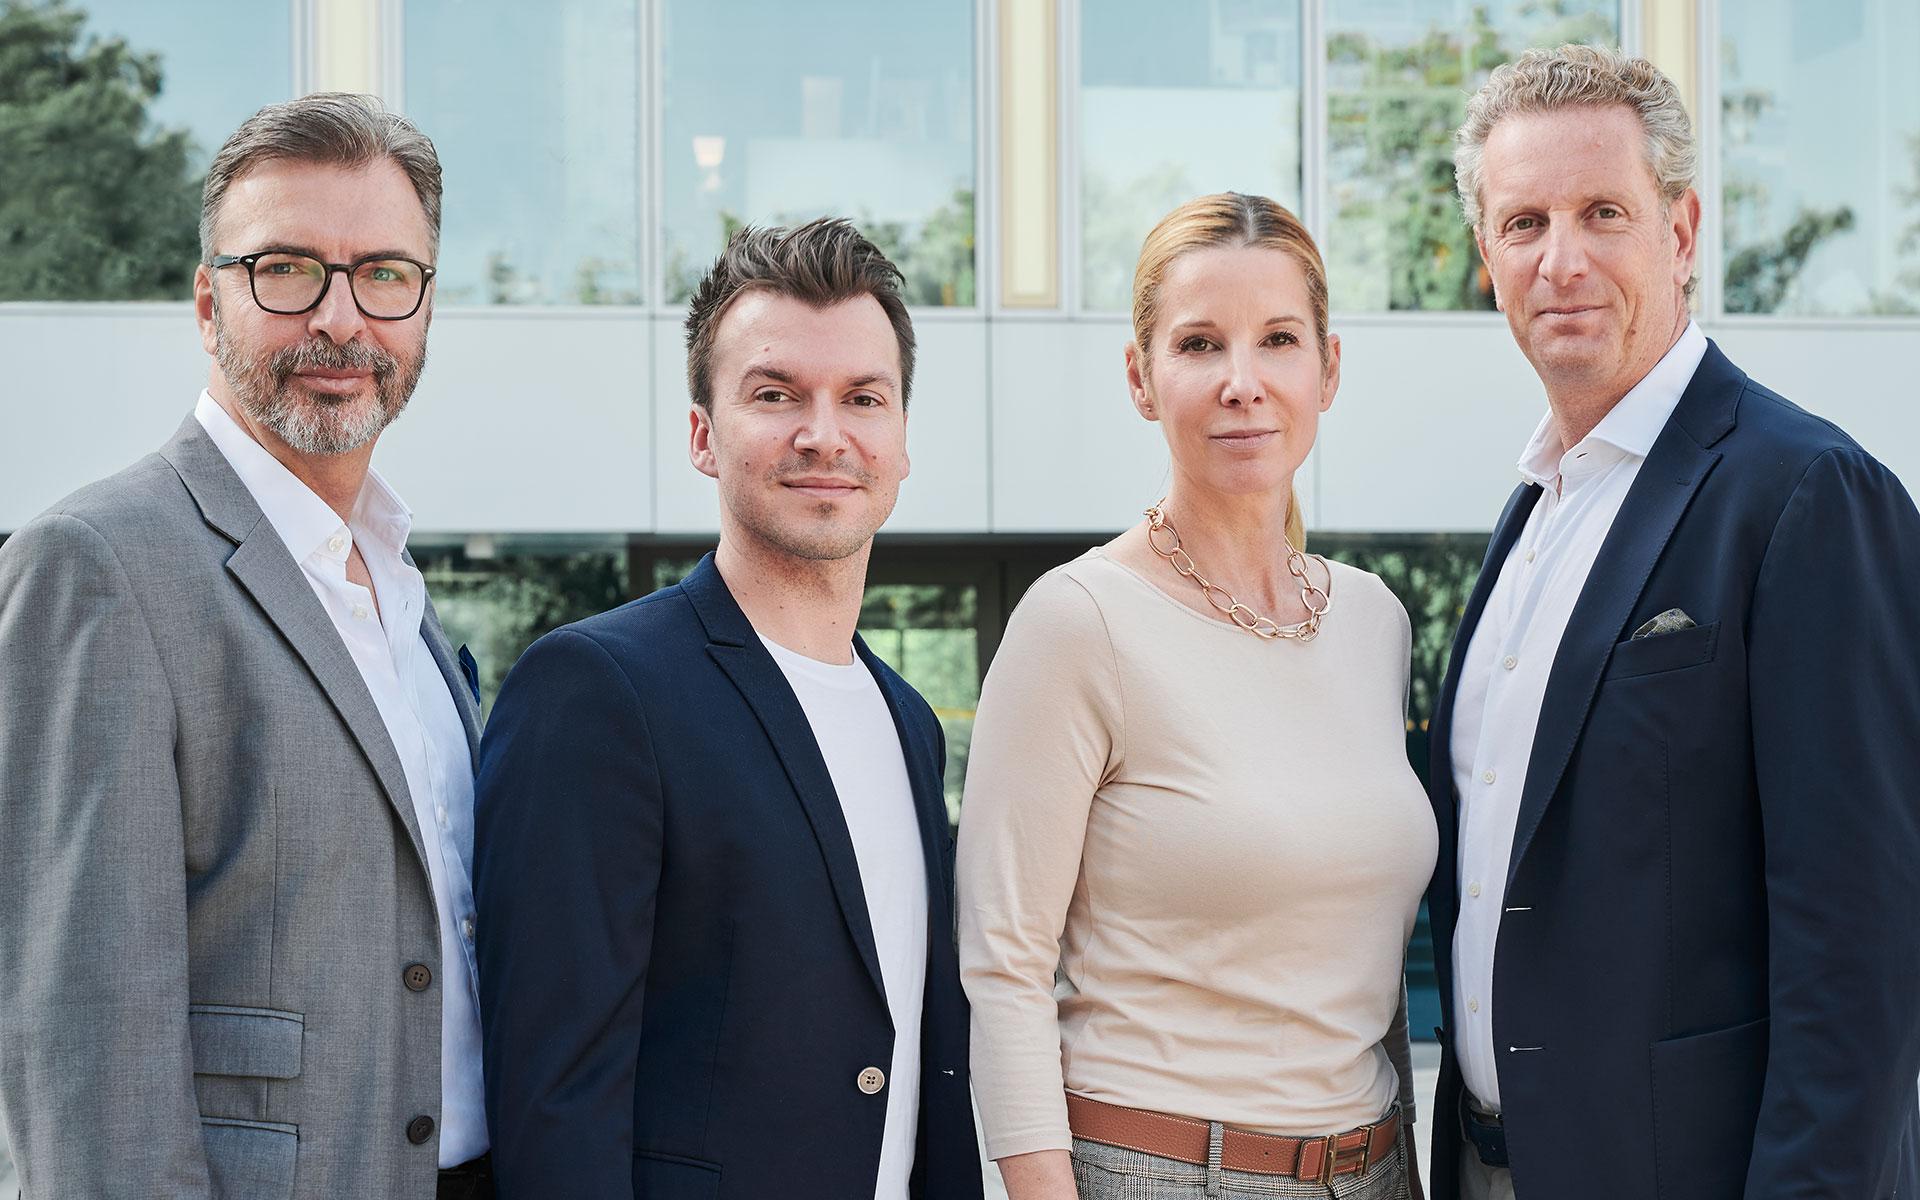 SJ-International: Thomas Junge, Stefan Kruschwitz, Andrea Meráth und Sebastiano Jaksetich (v.l.n.r.)